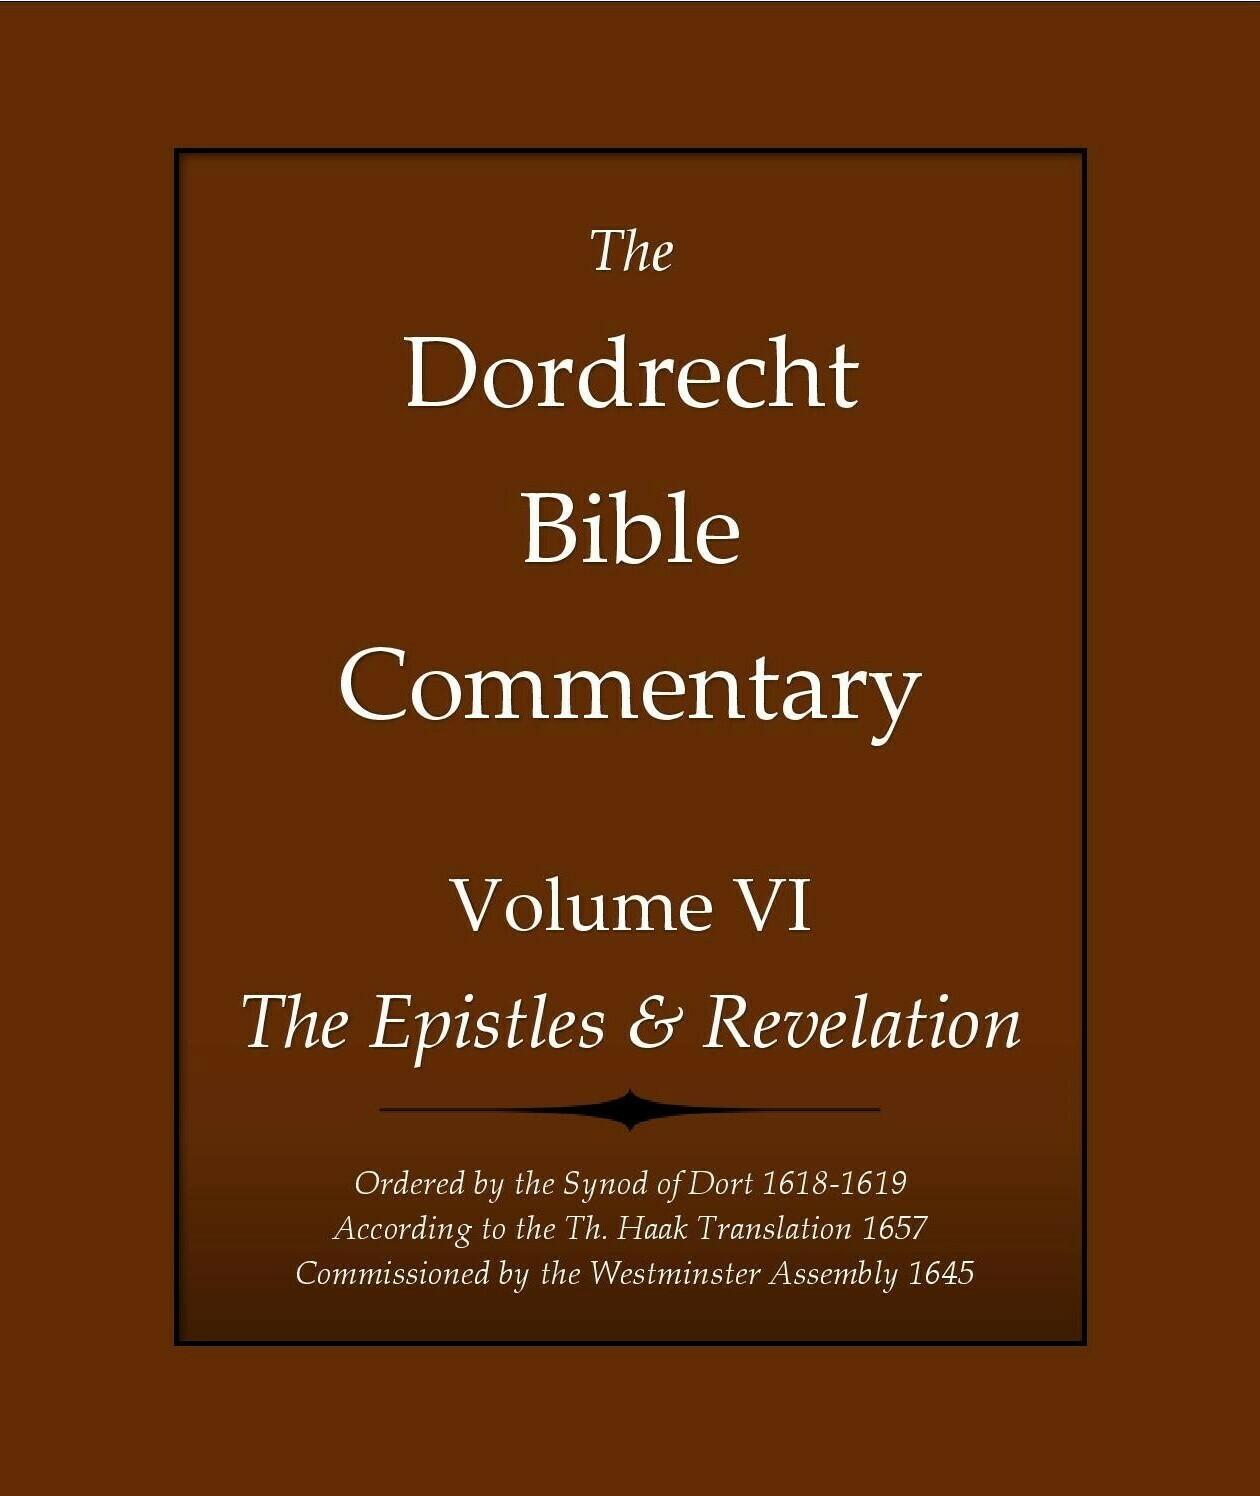 The Dordrecht Bible Commentary: Volume VI: The Epistles & Revelation (Soft-Cover & E-Book)